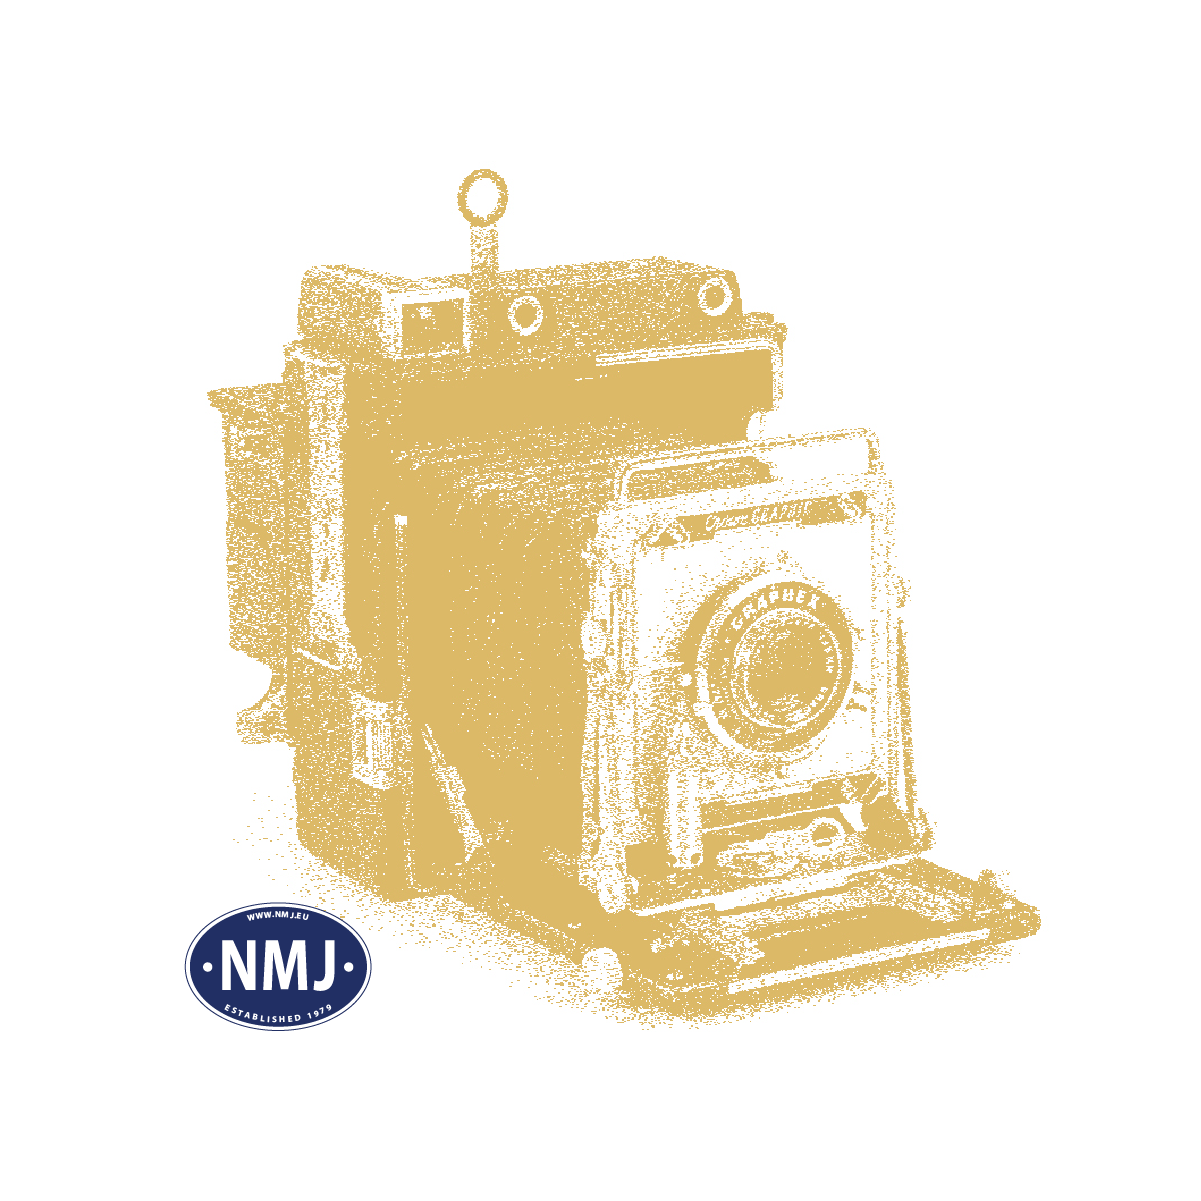 NMJT84.101 - NMJ Topline NSB BM69A.01, DC